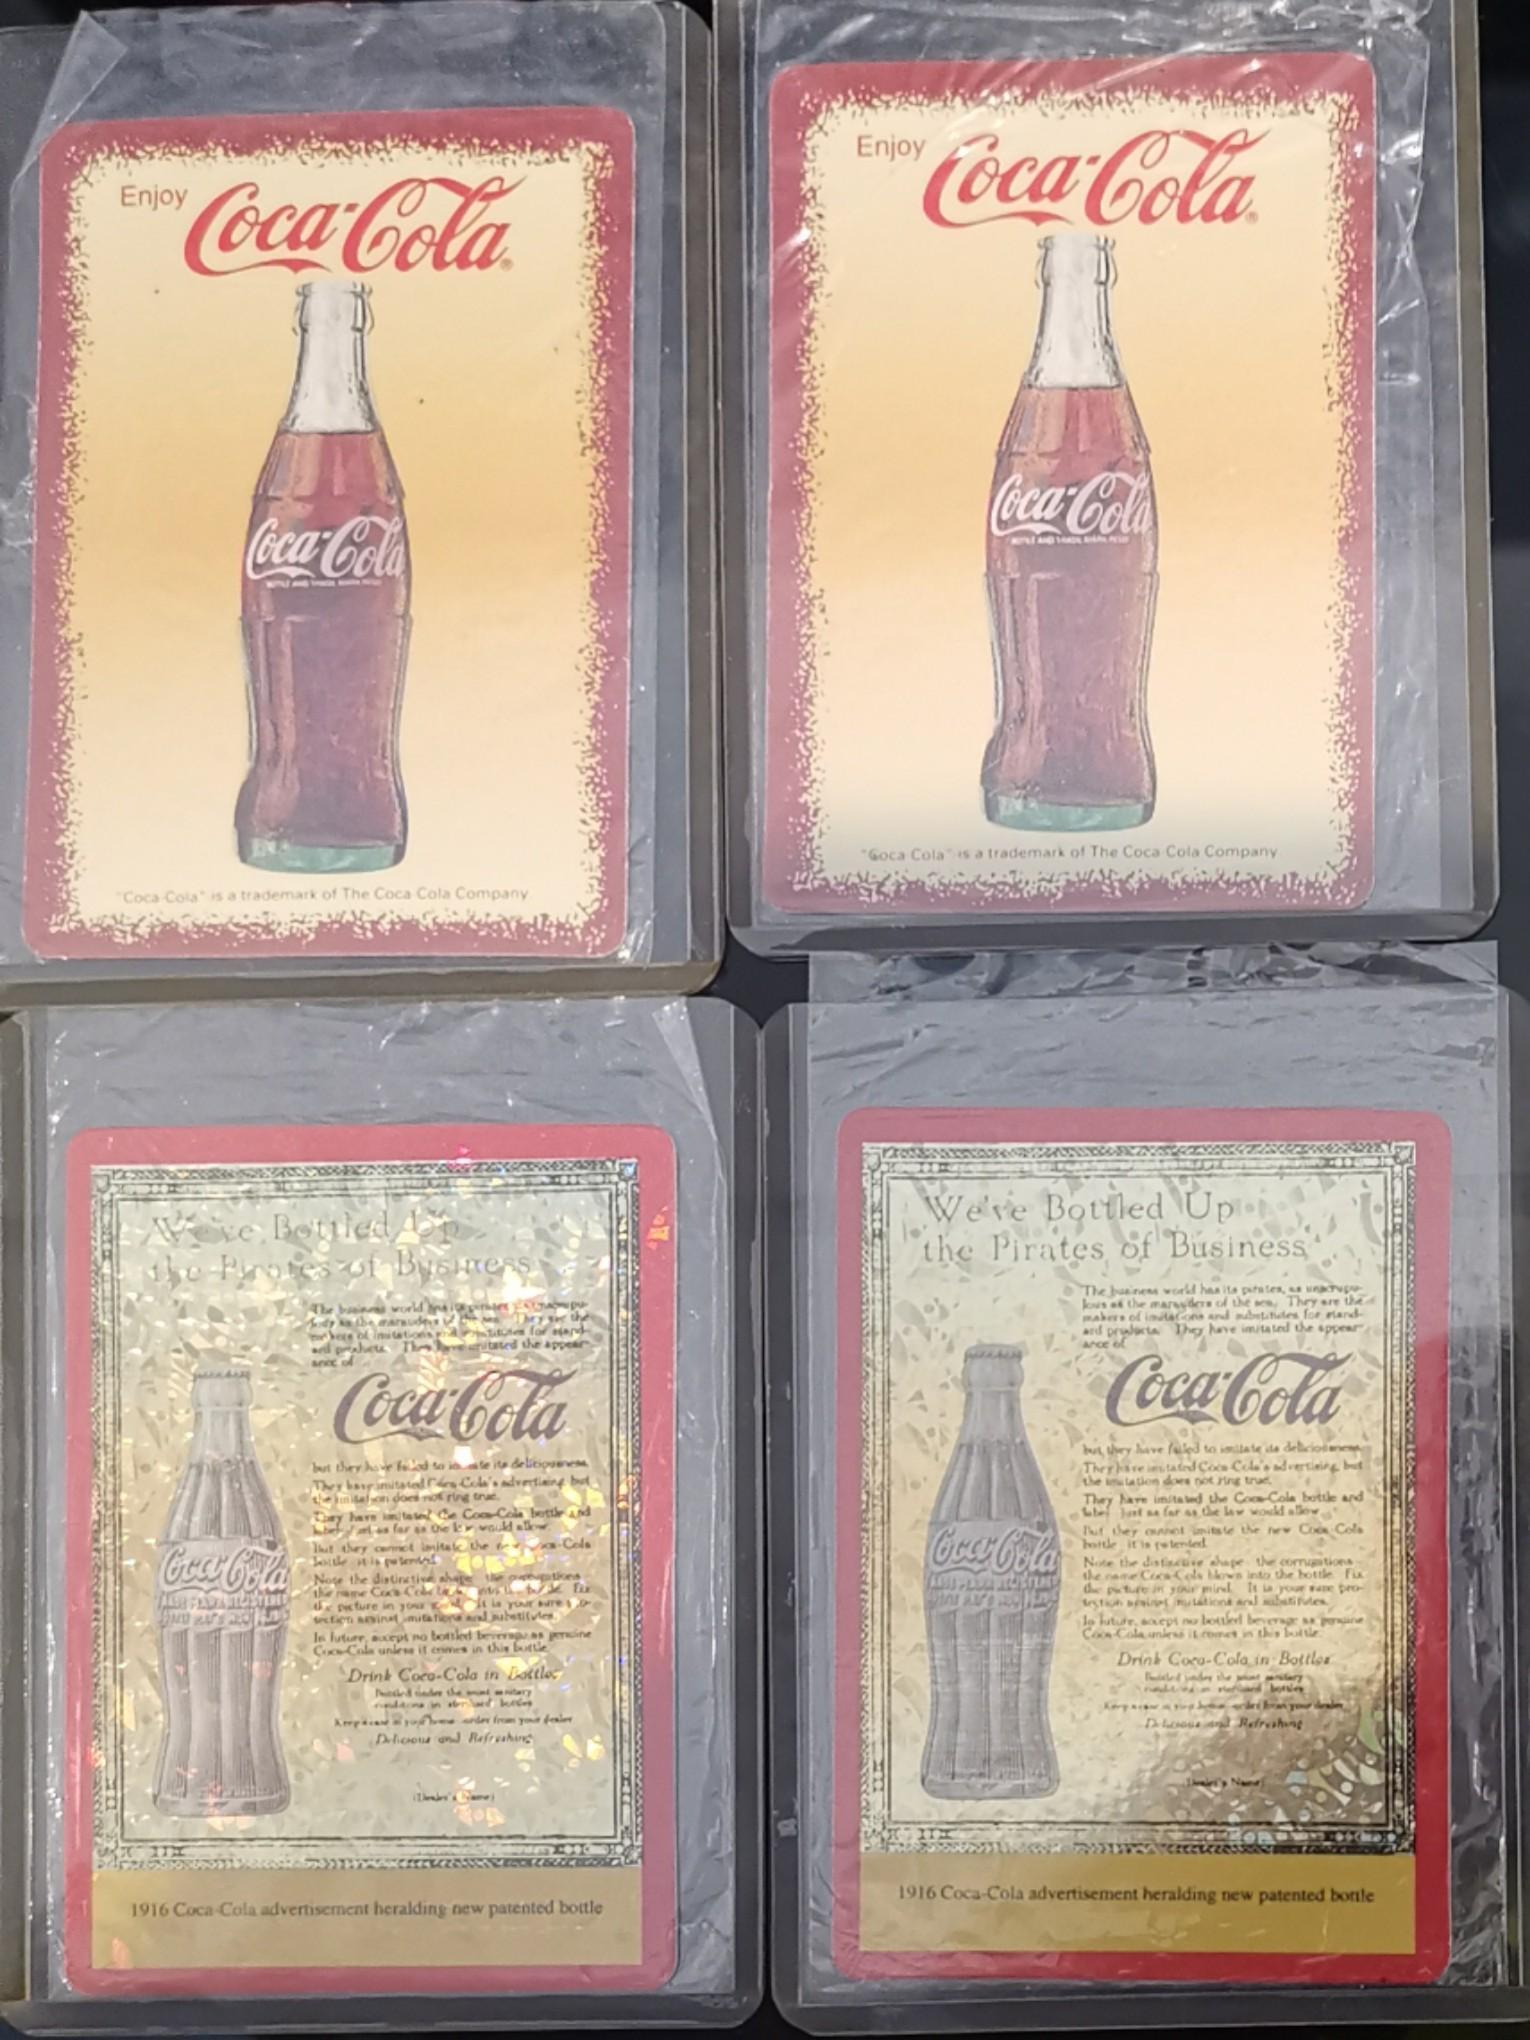 可口可樂珍藏閃卡 Coca Cola Collection Card